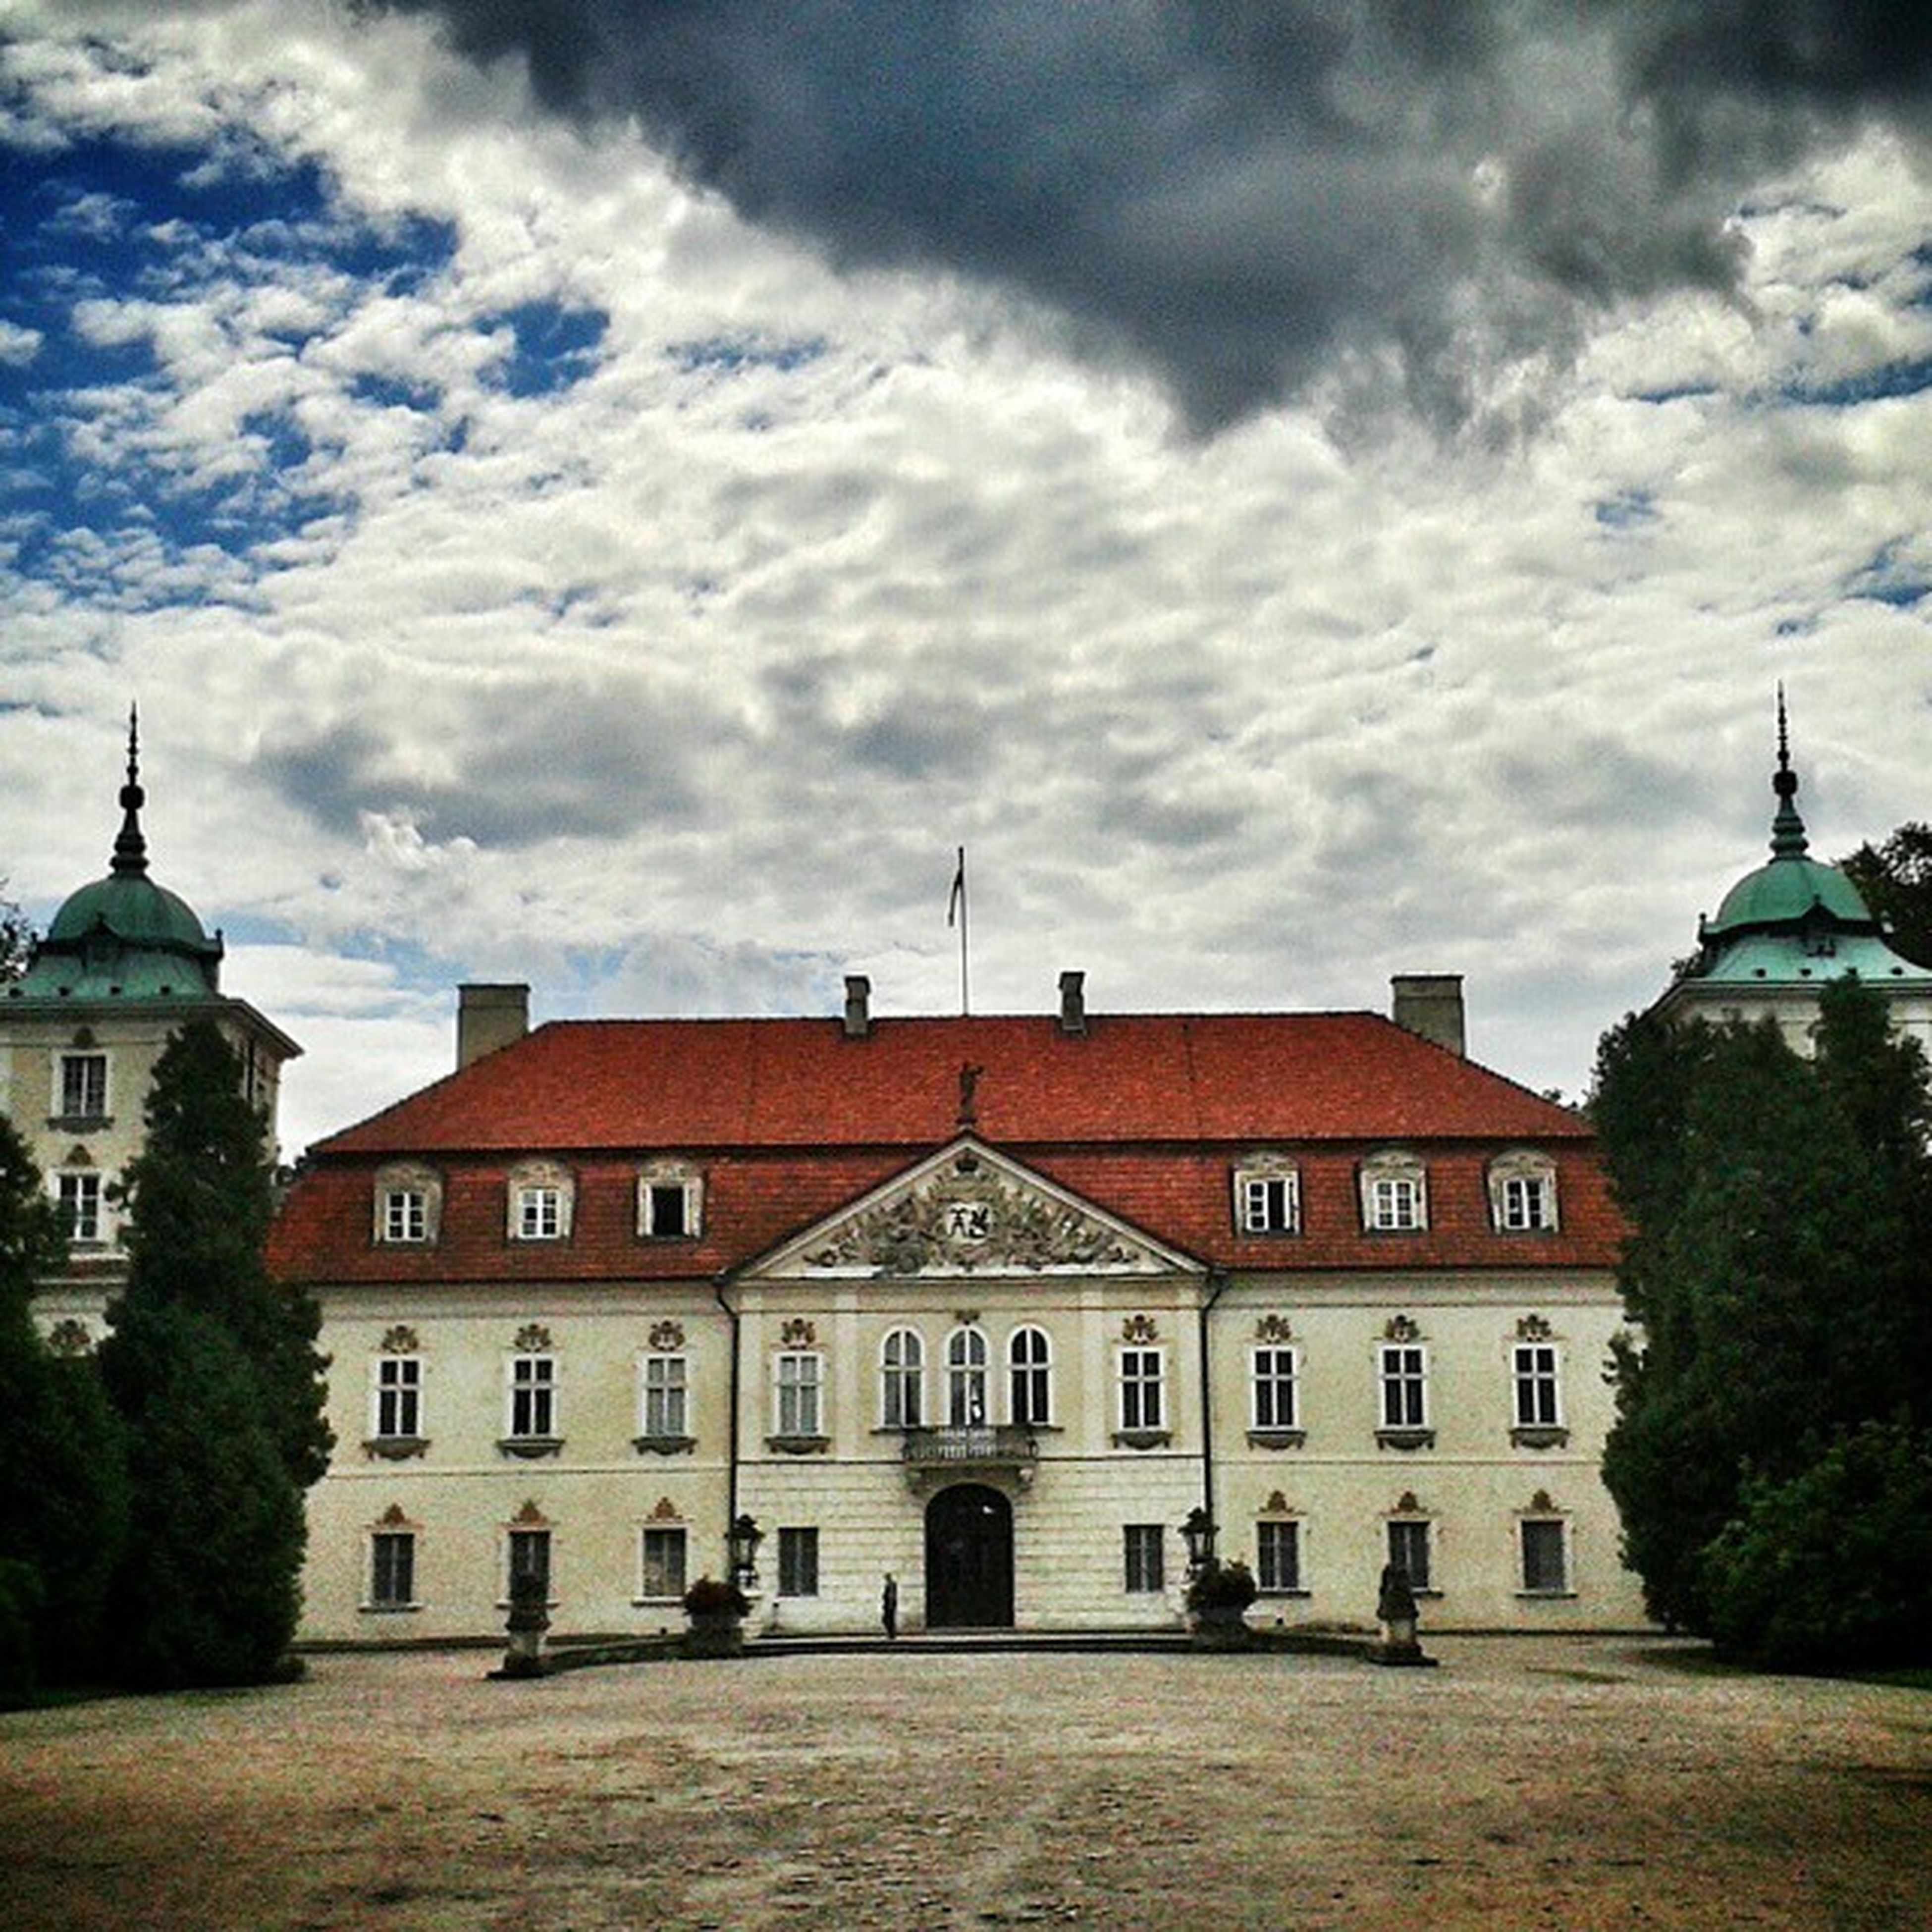 Nieborów Palace Poland Loves_Poland lubiepolske ourpoland mobilnytydzien heritagebuilding rsa_architecture rsa_doorsandwindows heritage architecture_hunter architectureporn architecturegram archifreaks architecturephotography